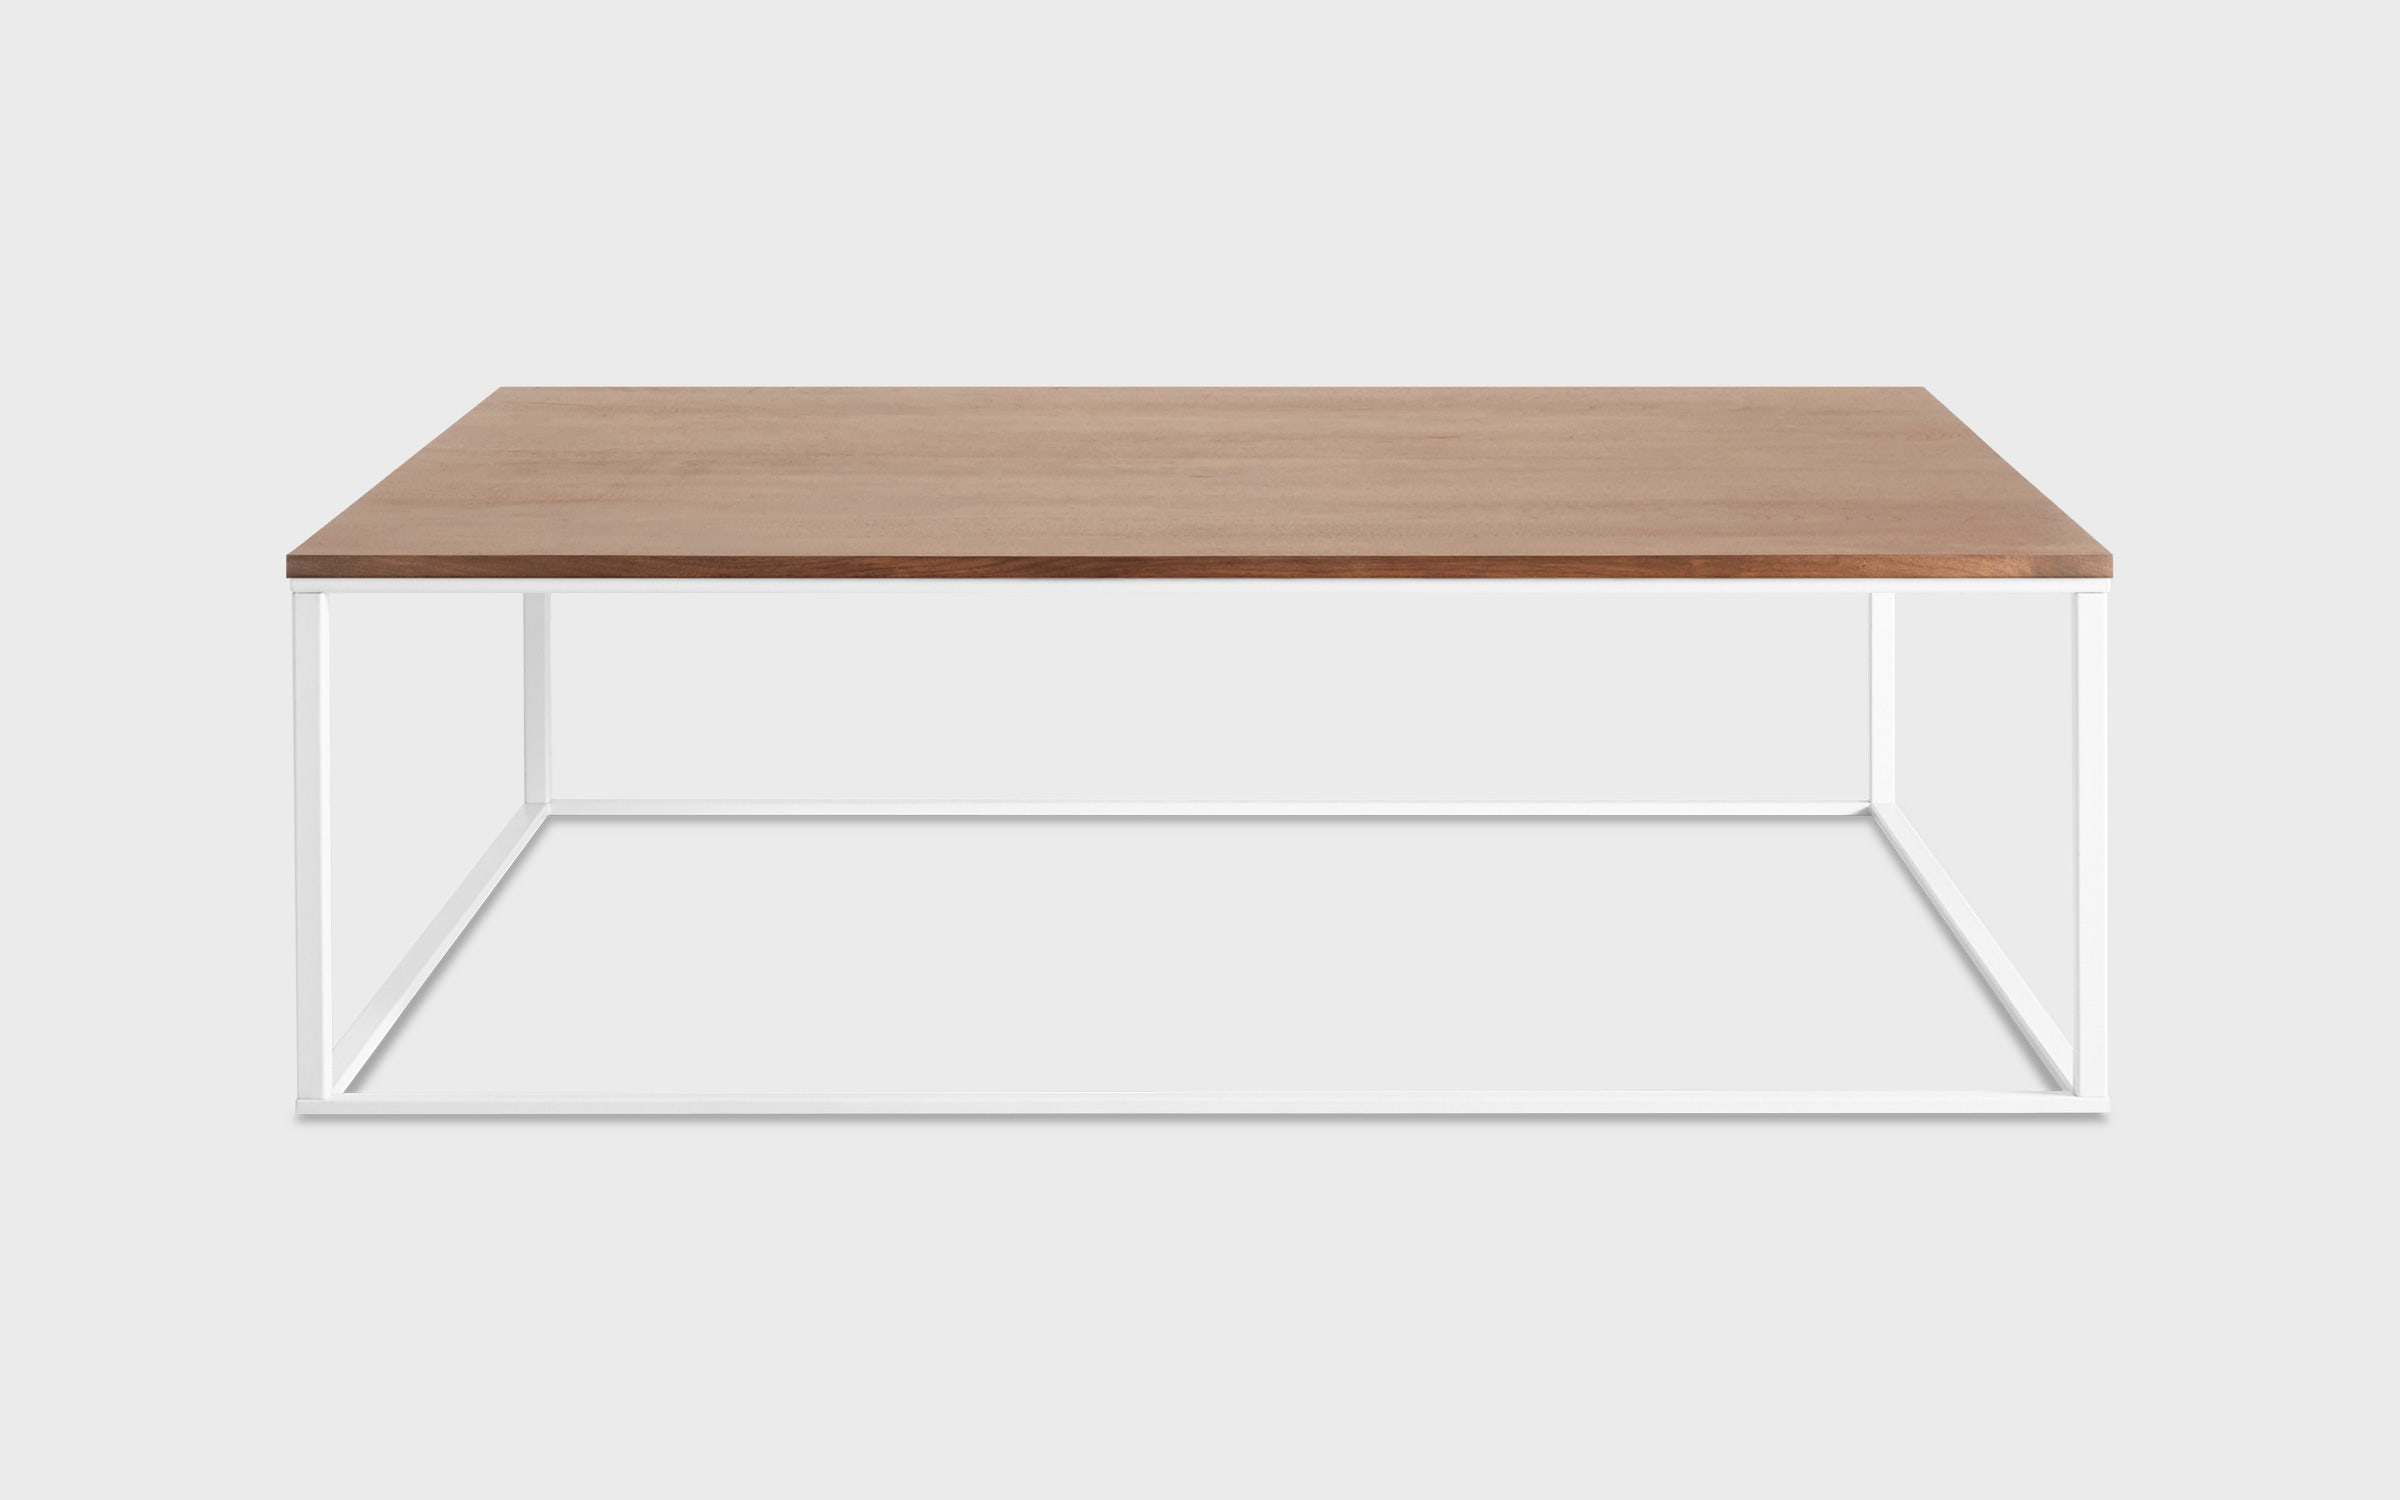 Minimalista Square Coffee Table